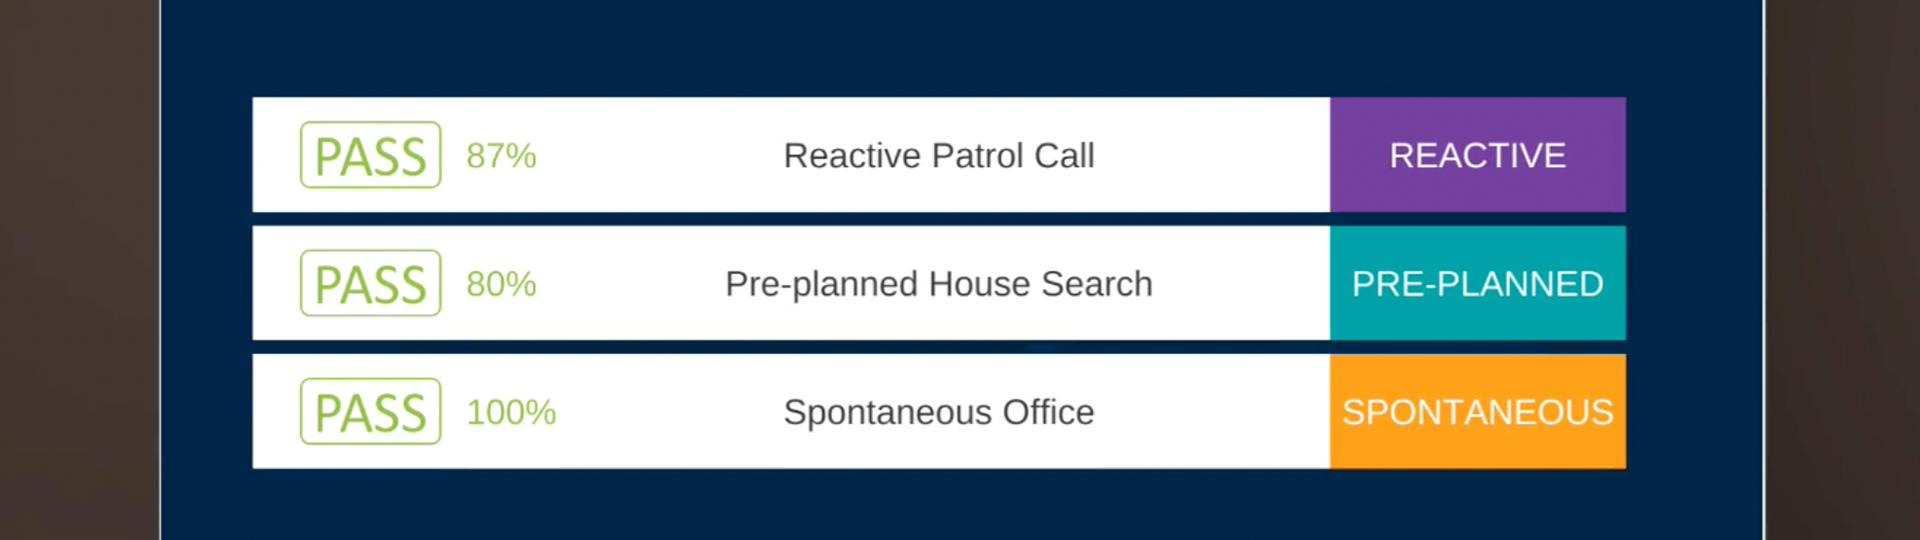 scenarios for FRG - Droman Solutions immersive platform